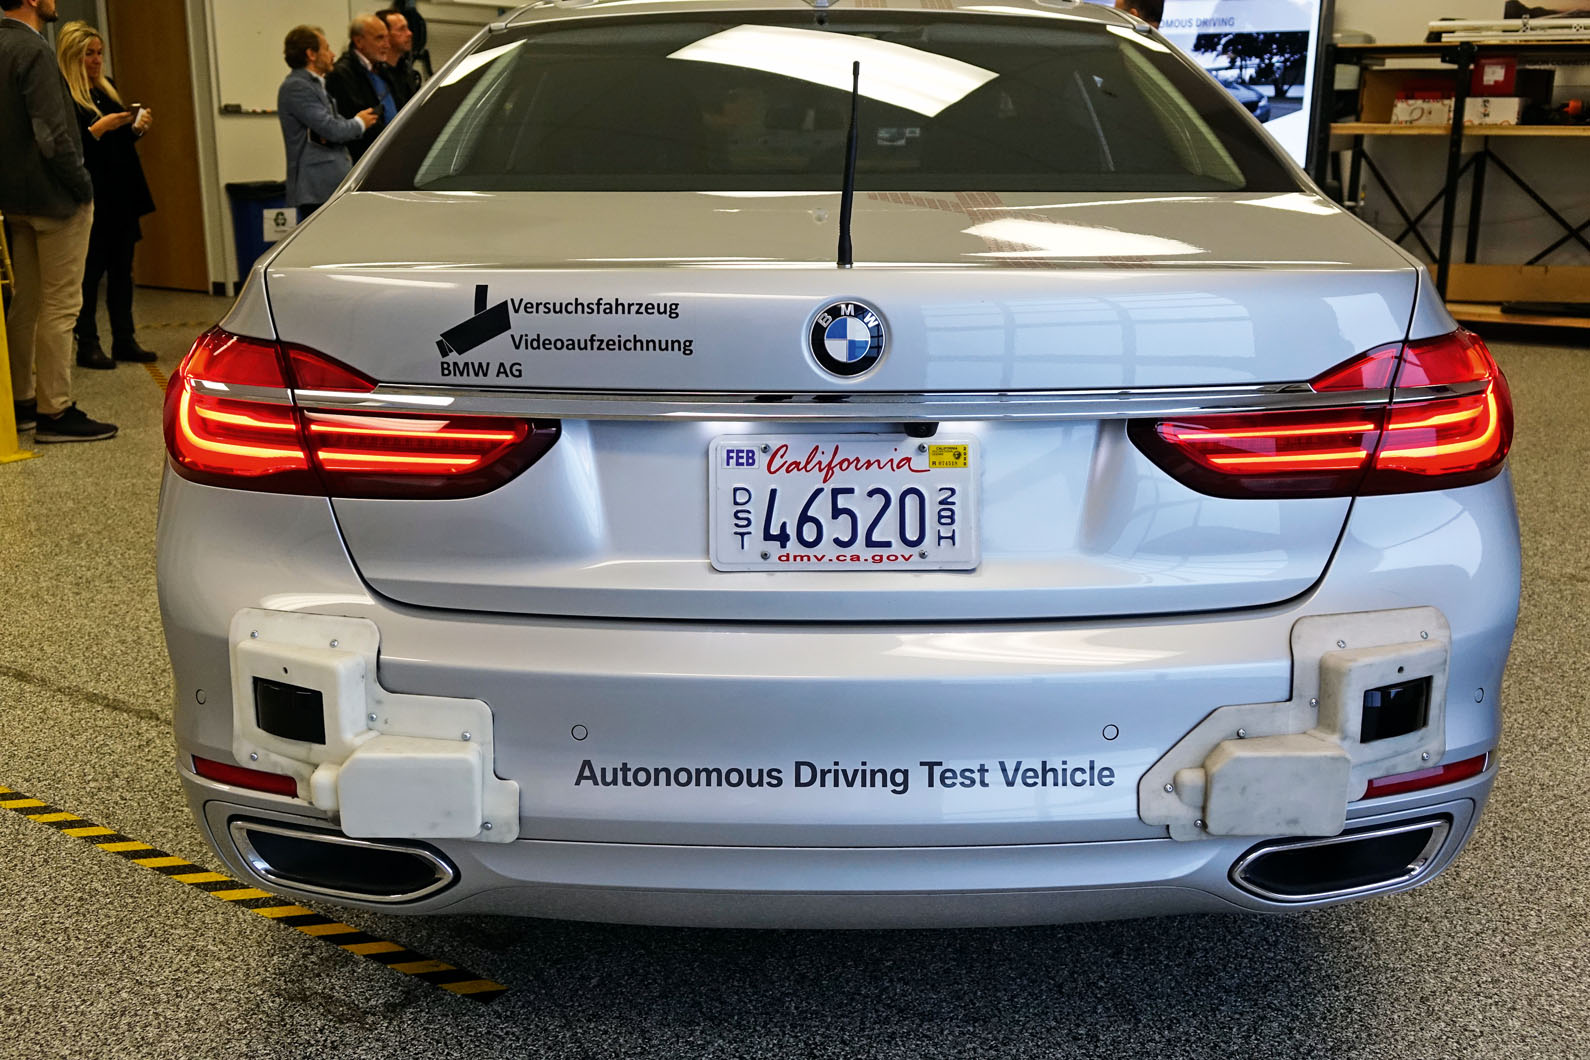 Bmw Lifts Lid On Its Self Driving Vehicle Tech Autocar